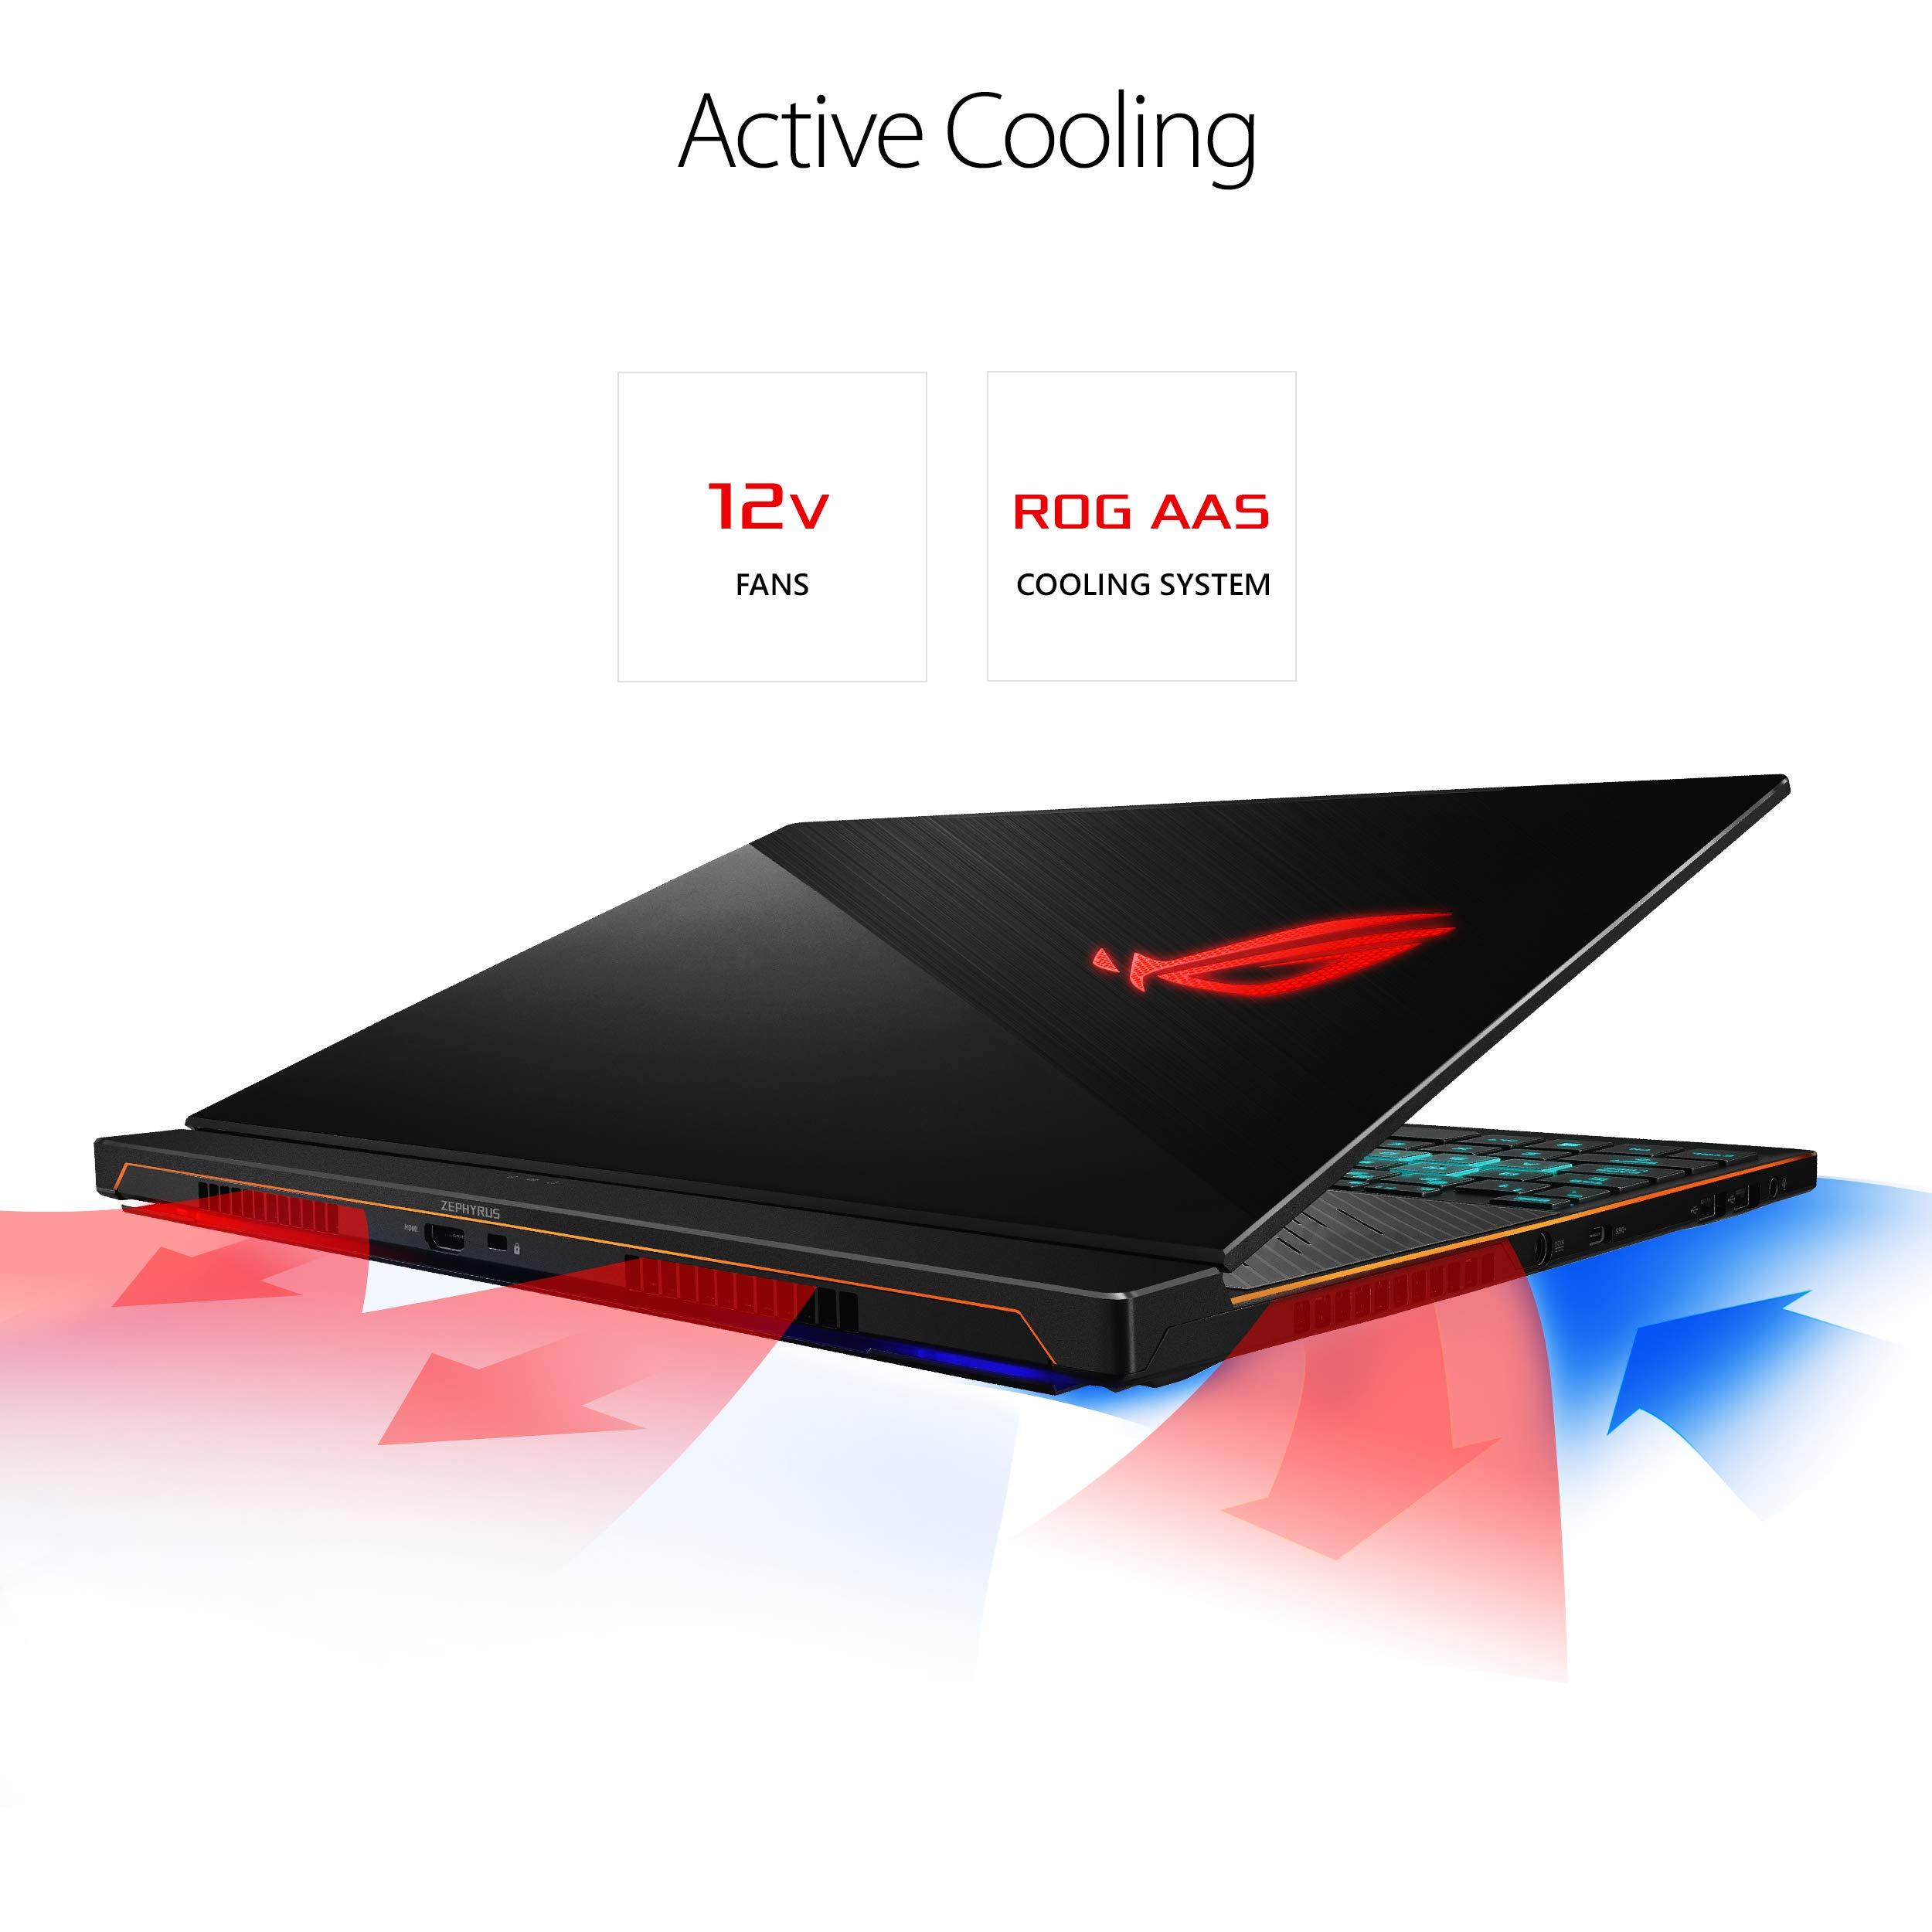 "ASUS ROG Zephyrus S Ultra Slim Gaming Laptop, 15.6"" 144Hz, i7-8750H, GTX 1070, 16GB DDR4, 512GB PCIe NVMe SSD, GX531GS-AH76 & ASUS ROG Pugio RGB Gaming Mouse Bundle"